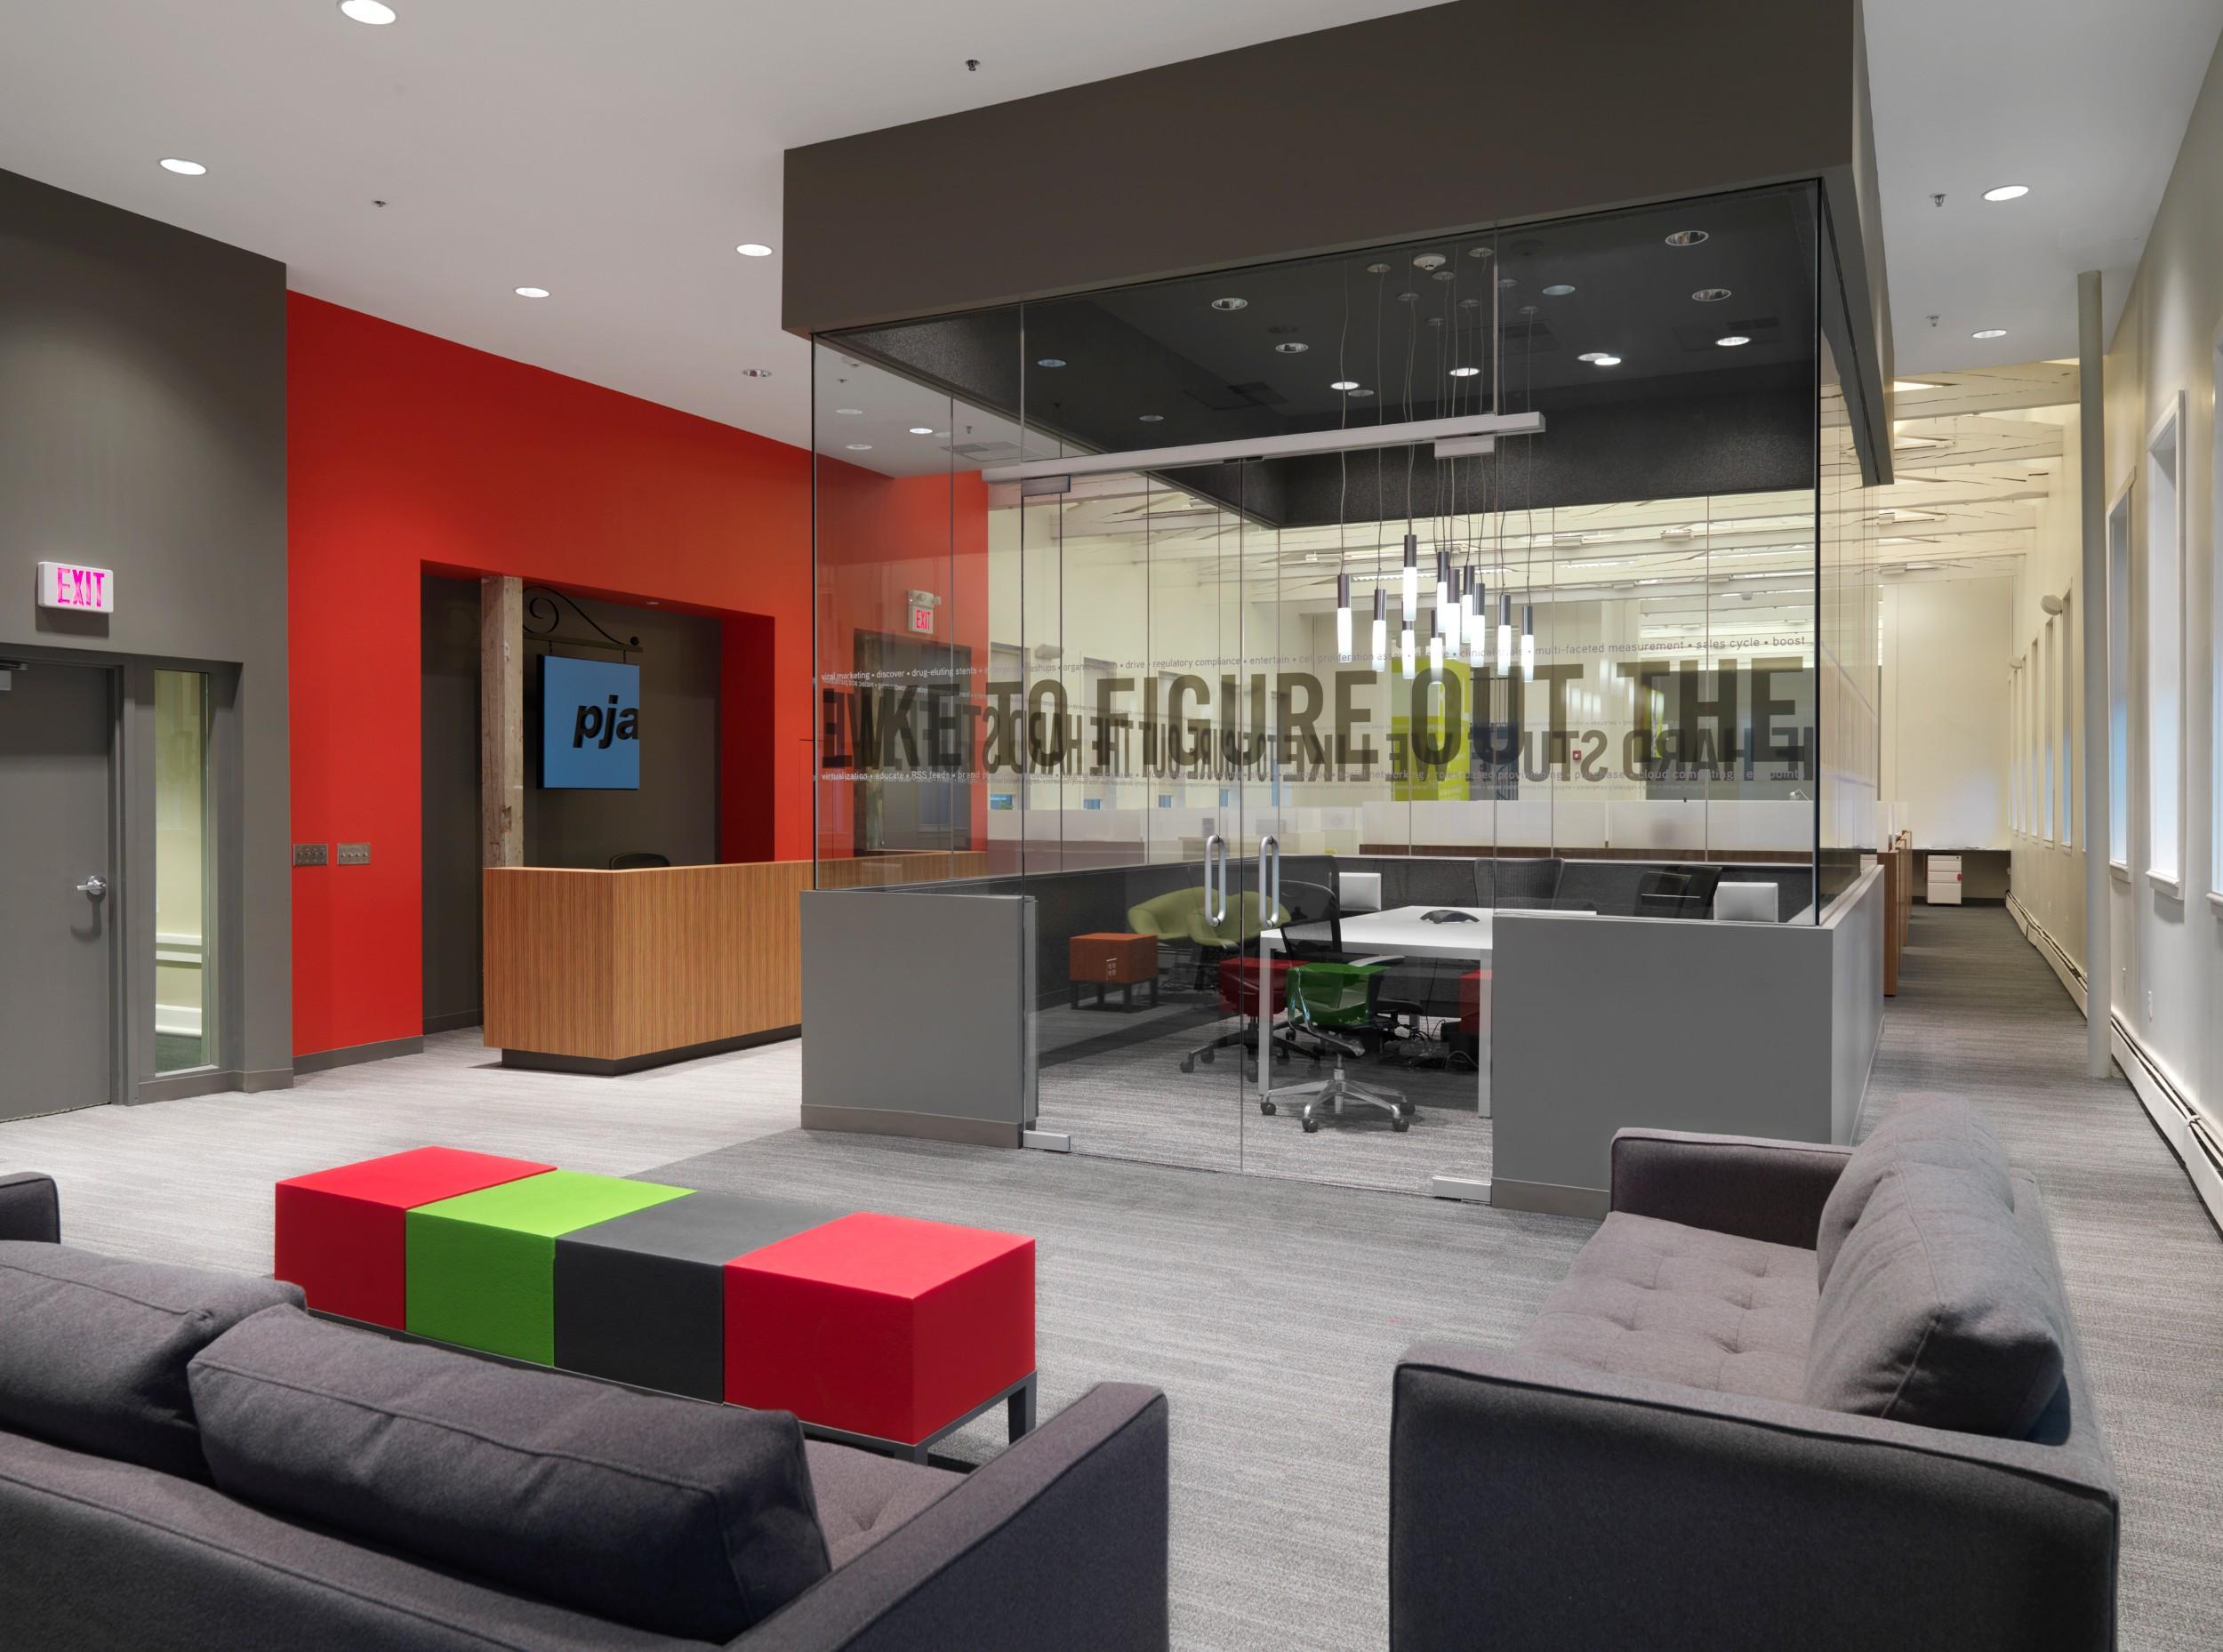 PJA_Advertising_Corderman_Construction_Center_Conference_Room.jpg